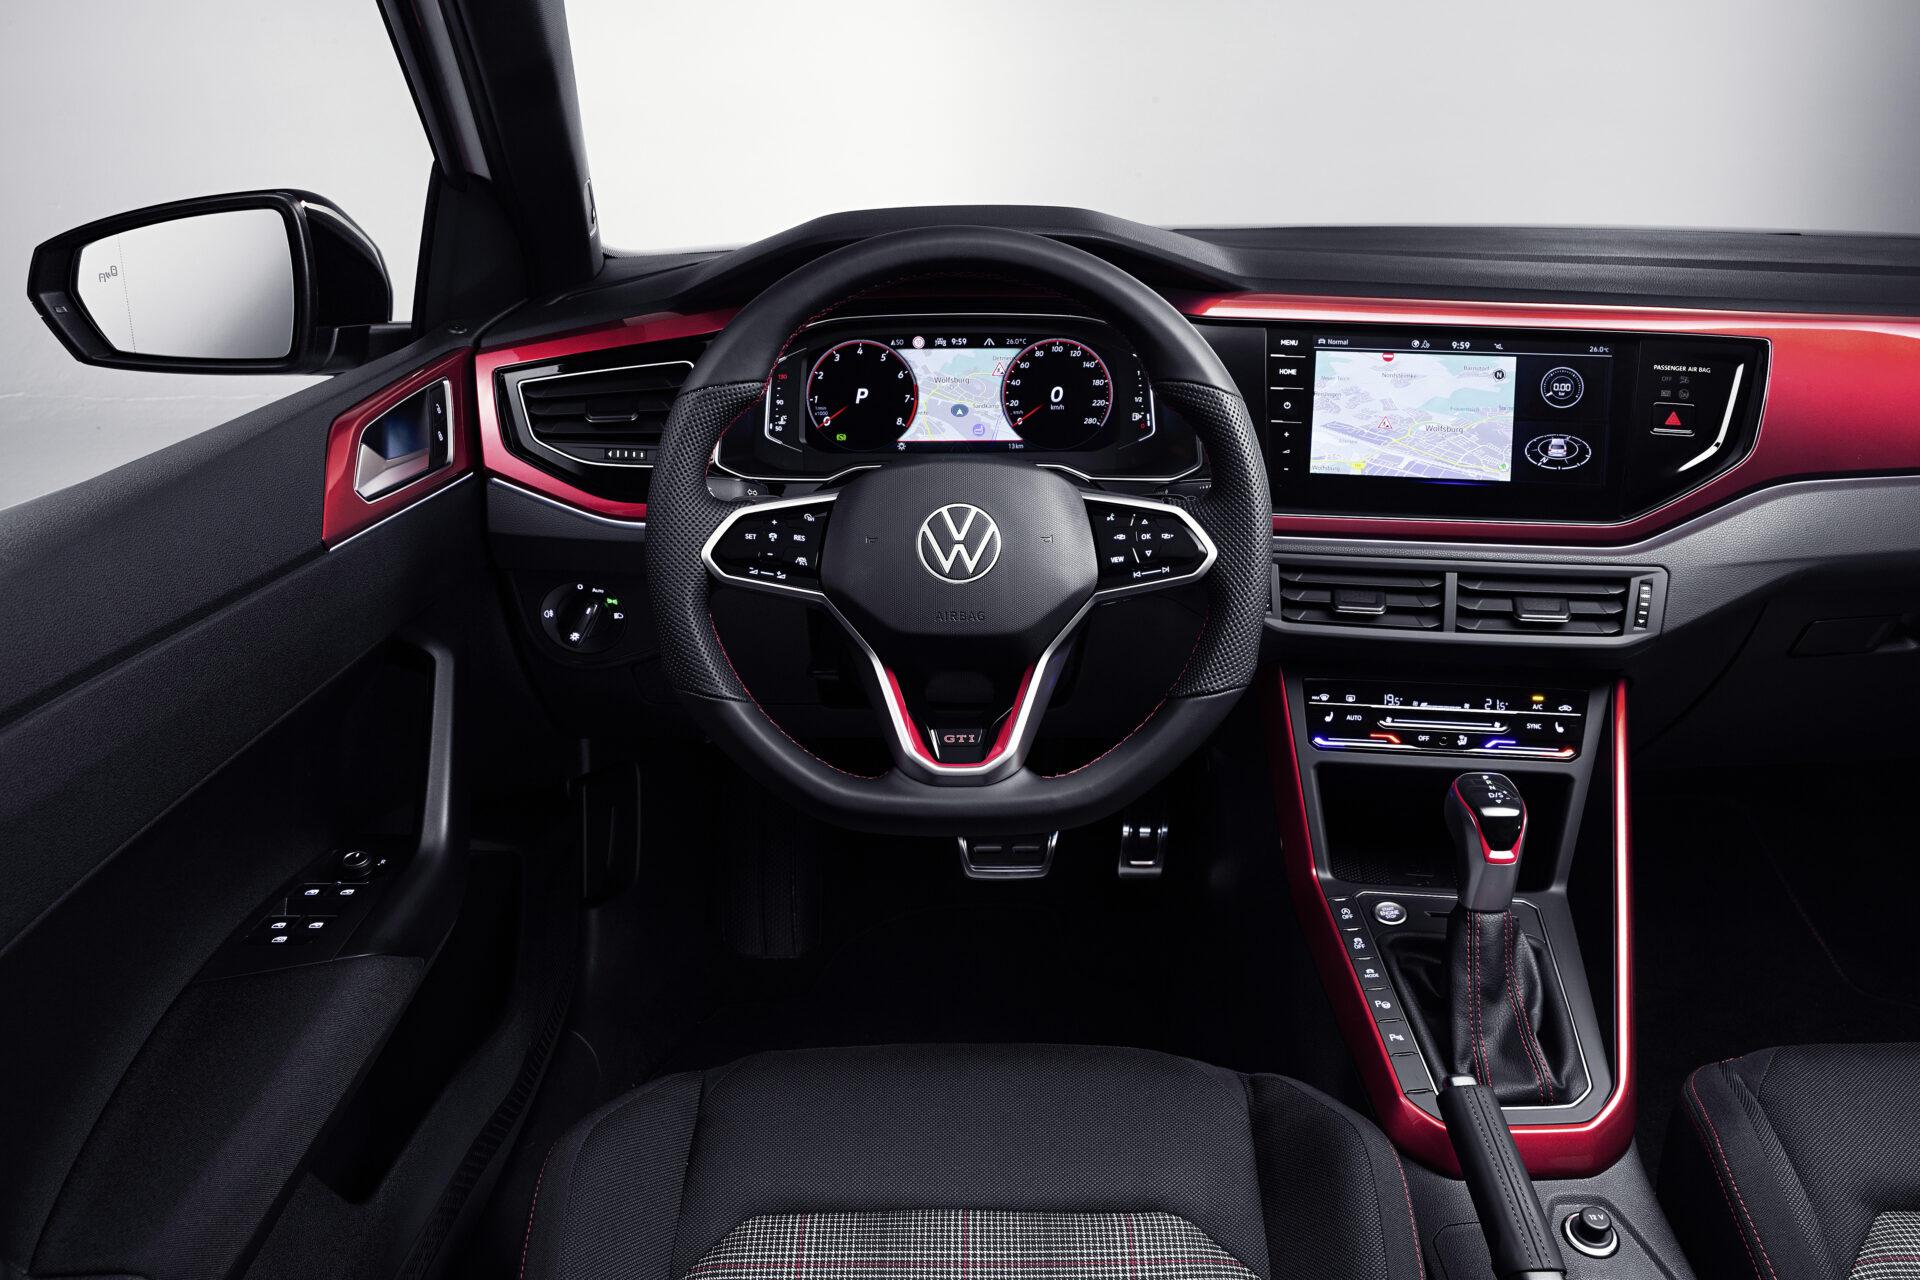 Volkswagen Polo GTI 2021 interior